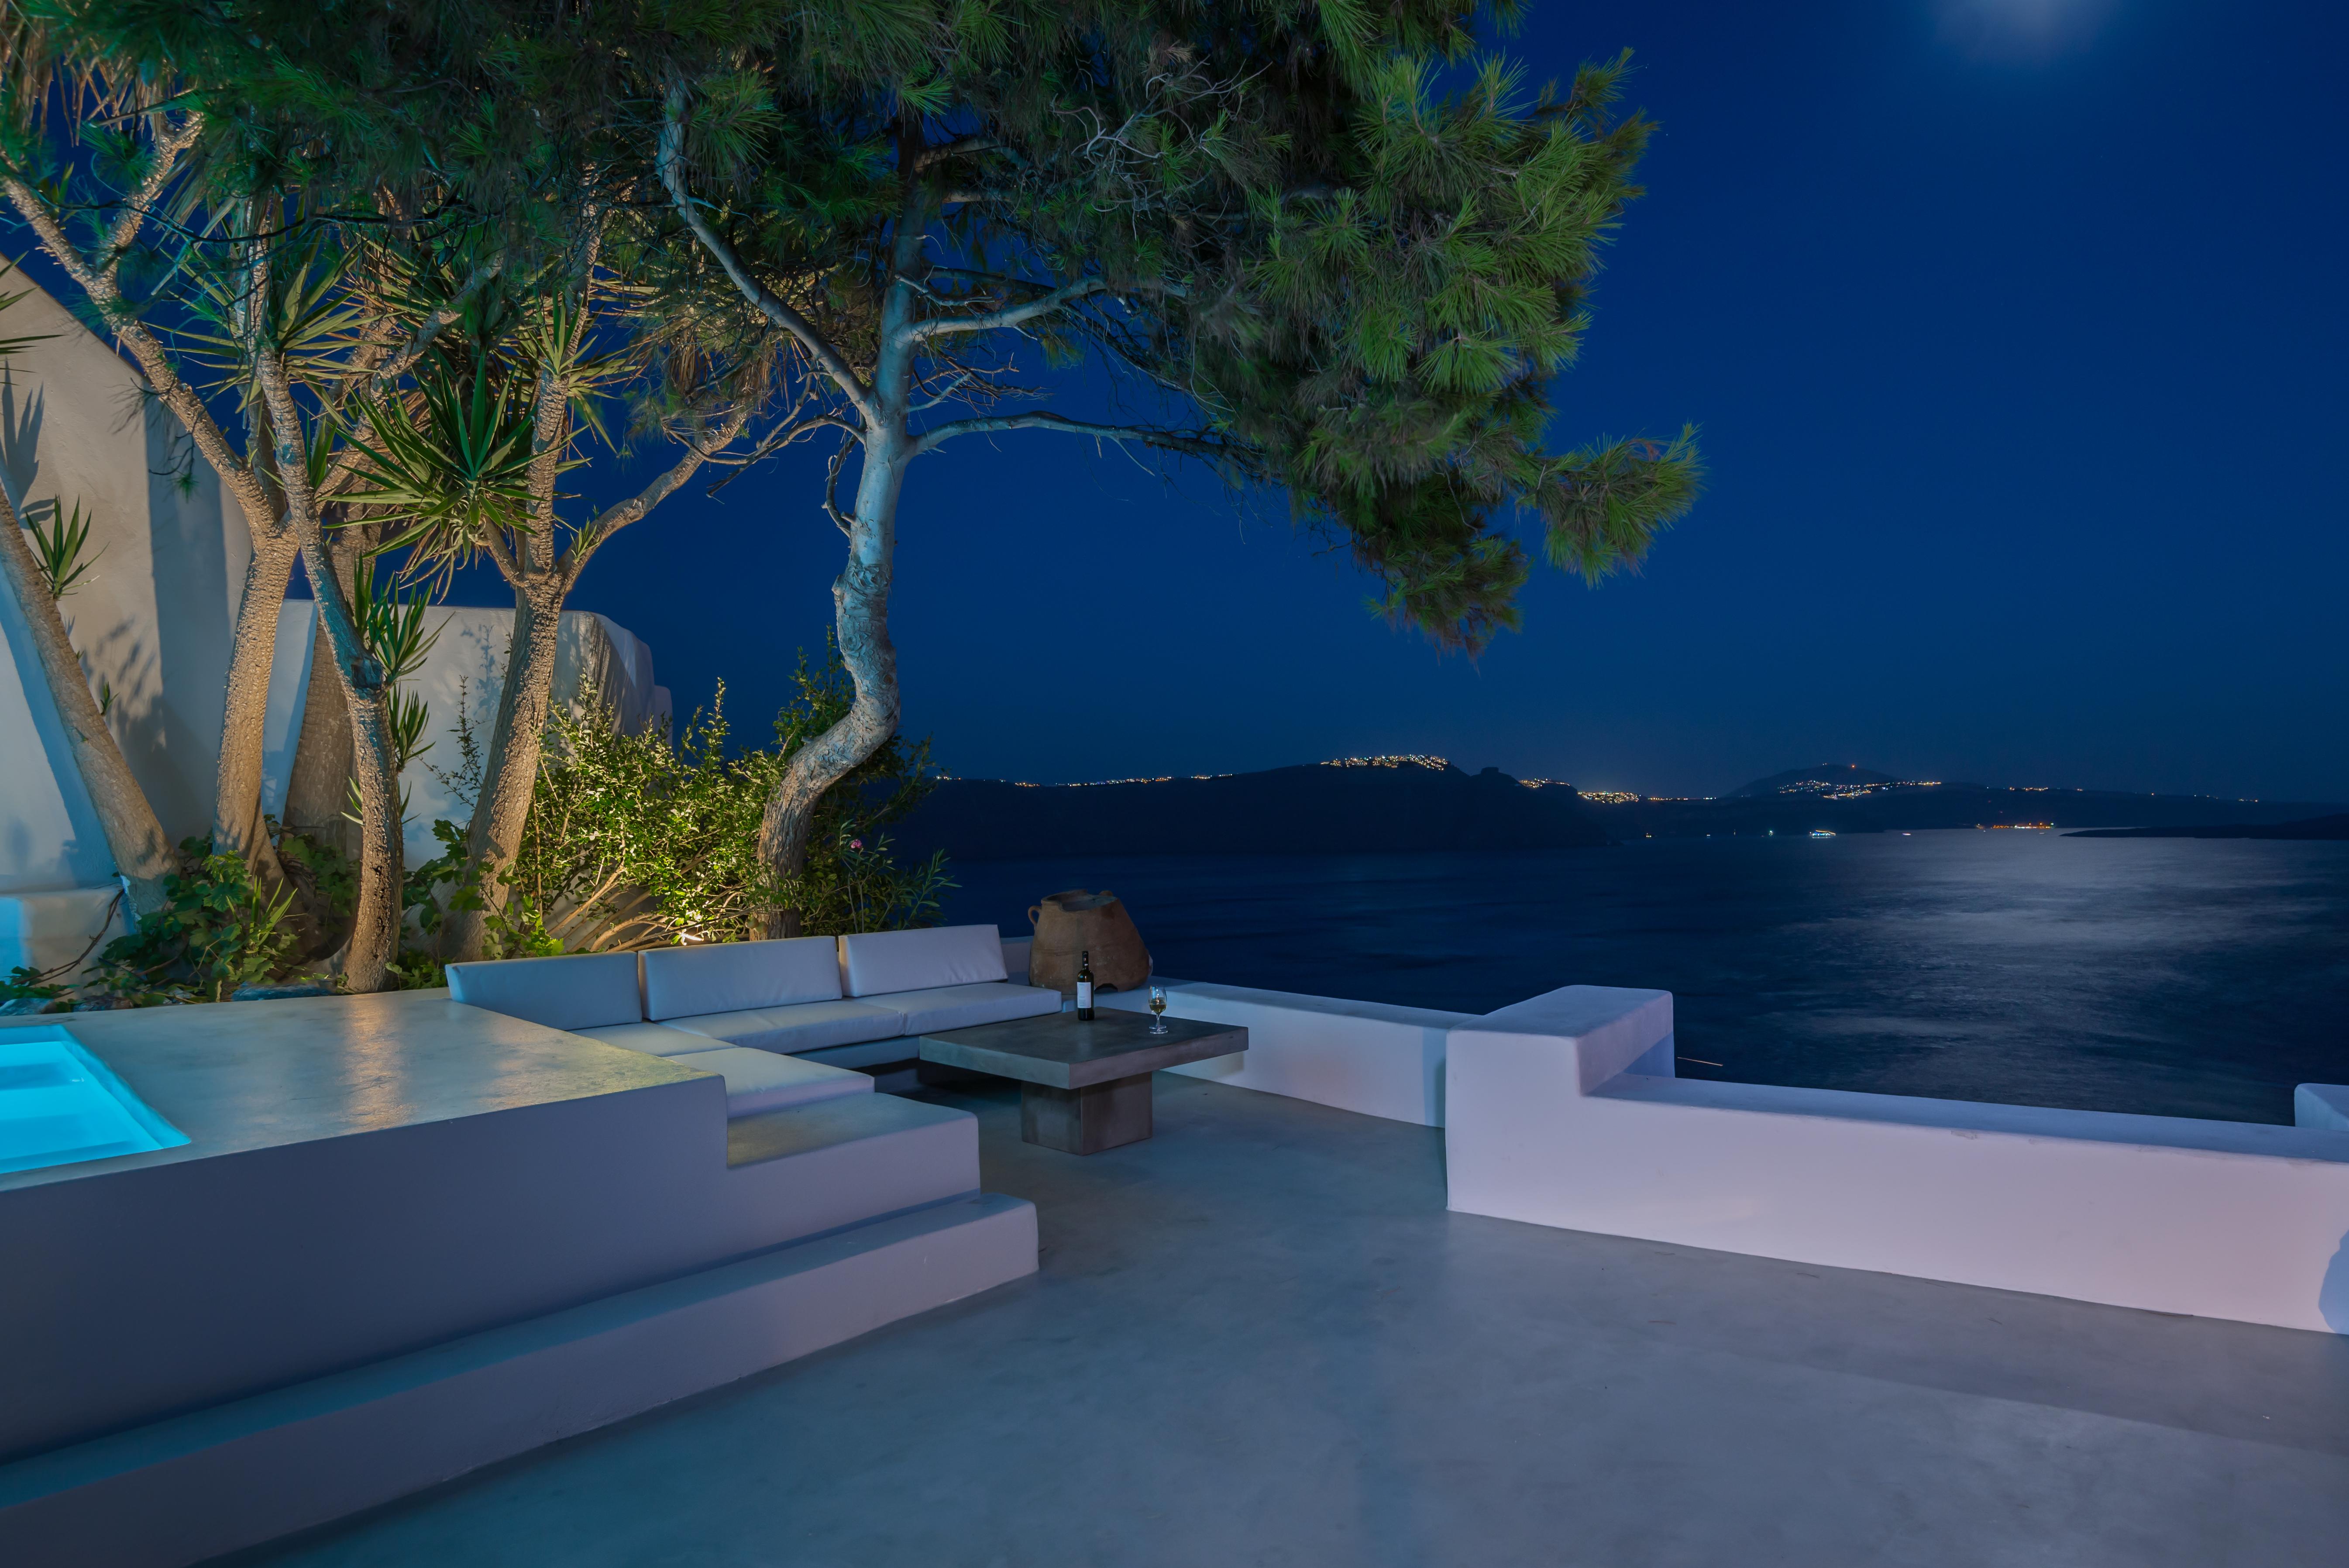 santorini-luxury-tailor-made-holiday